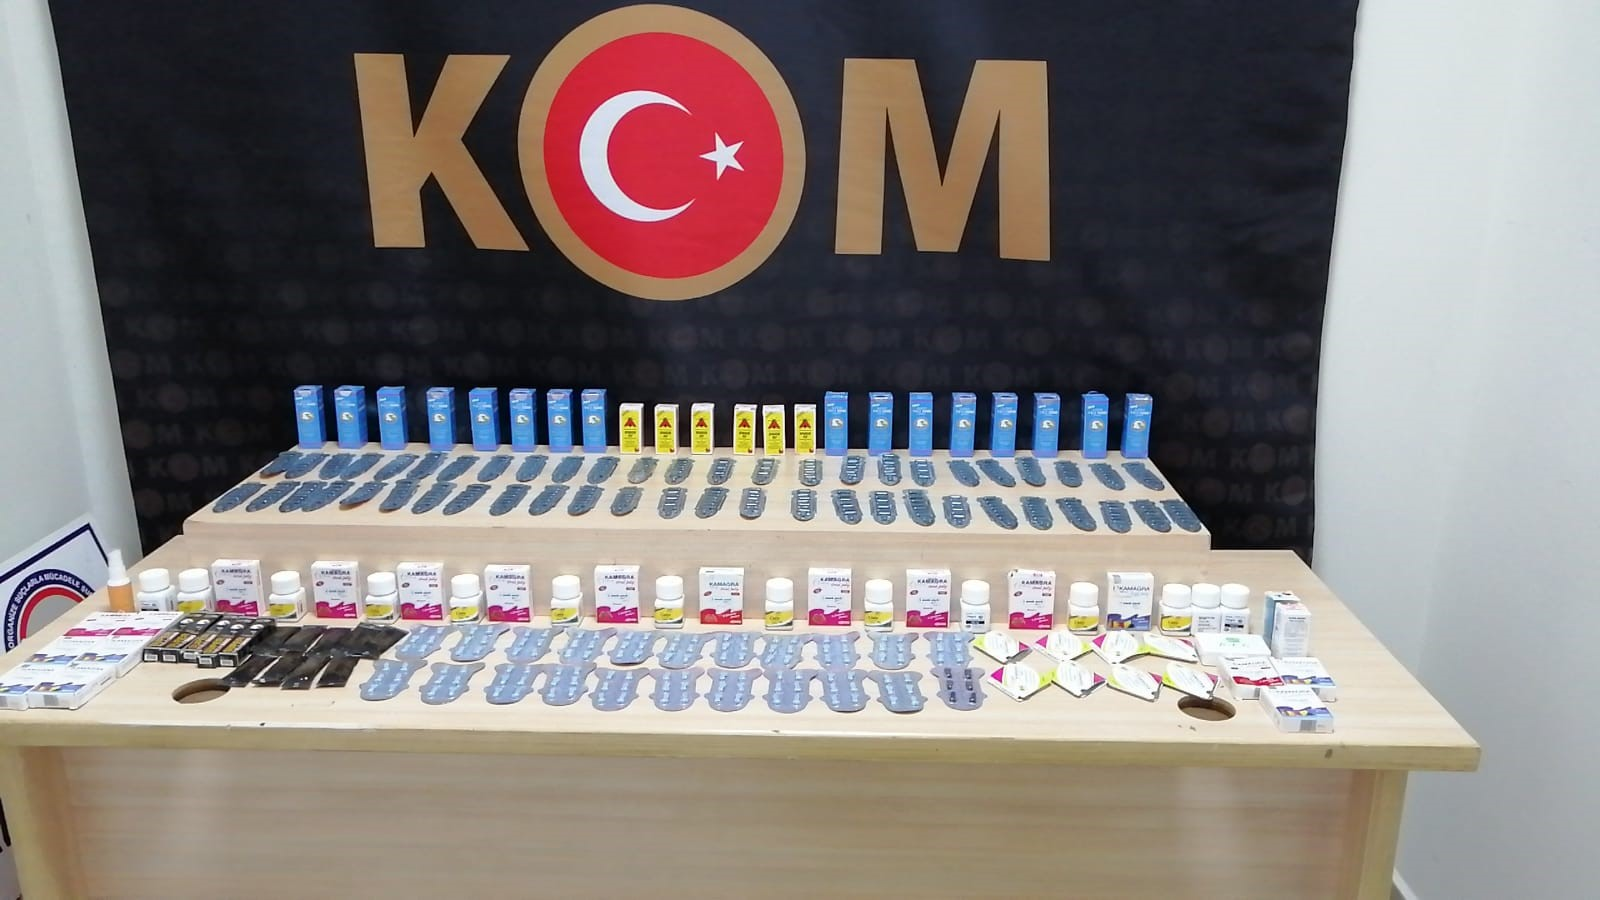 kom - DENİZLİ'DE SAHTE 100 TL'LİK BANKNOTLAR YAKALANDI